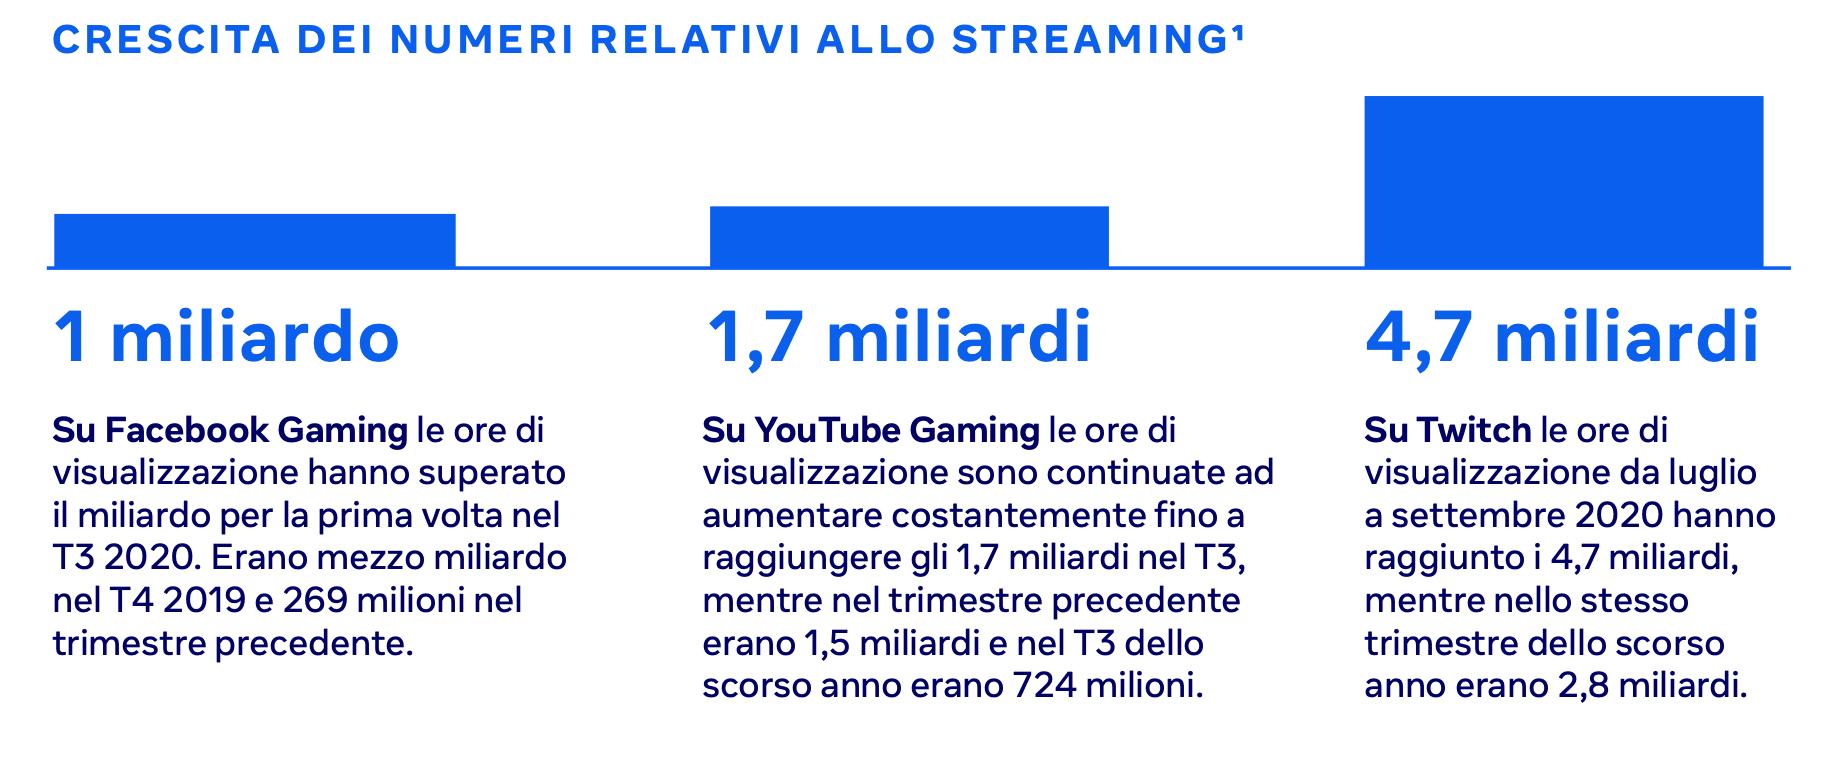 statistiche gaming 2021 - crescita numeri streaming